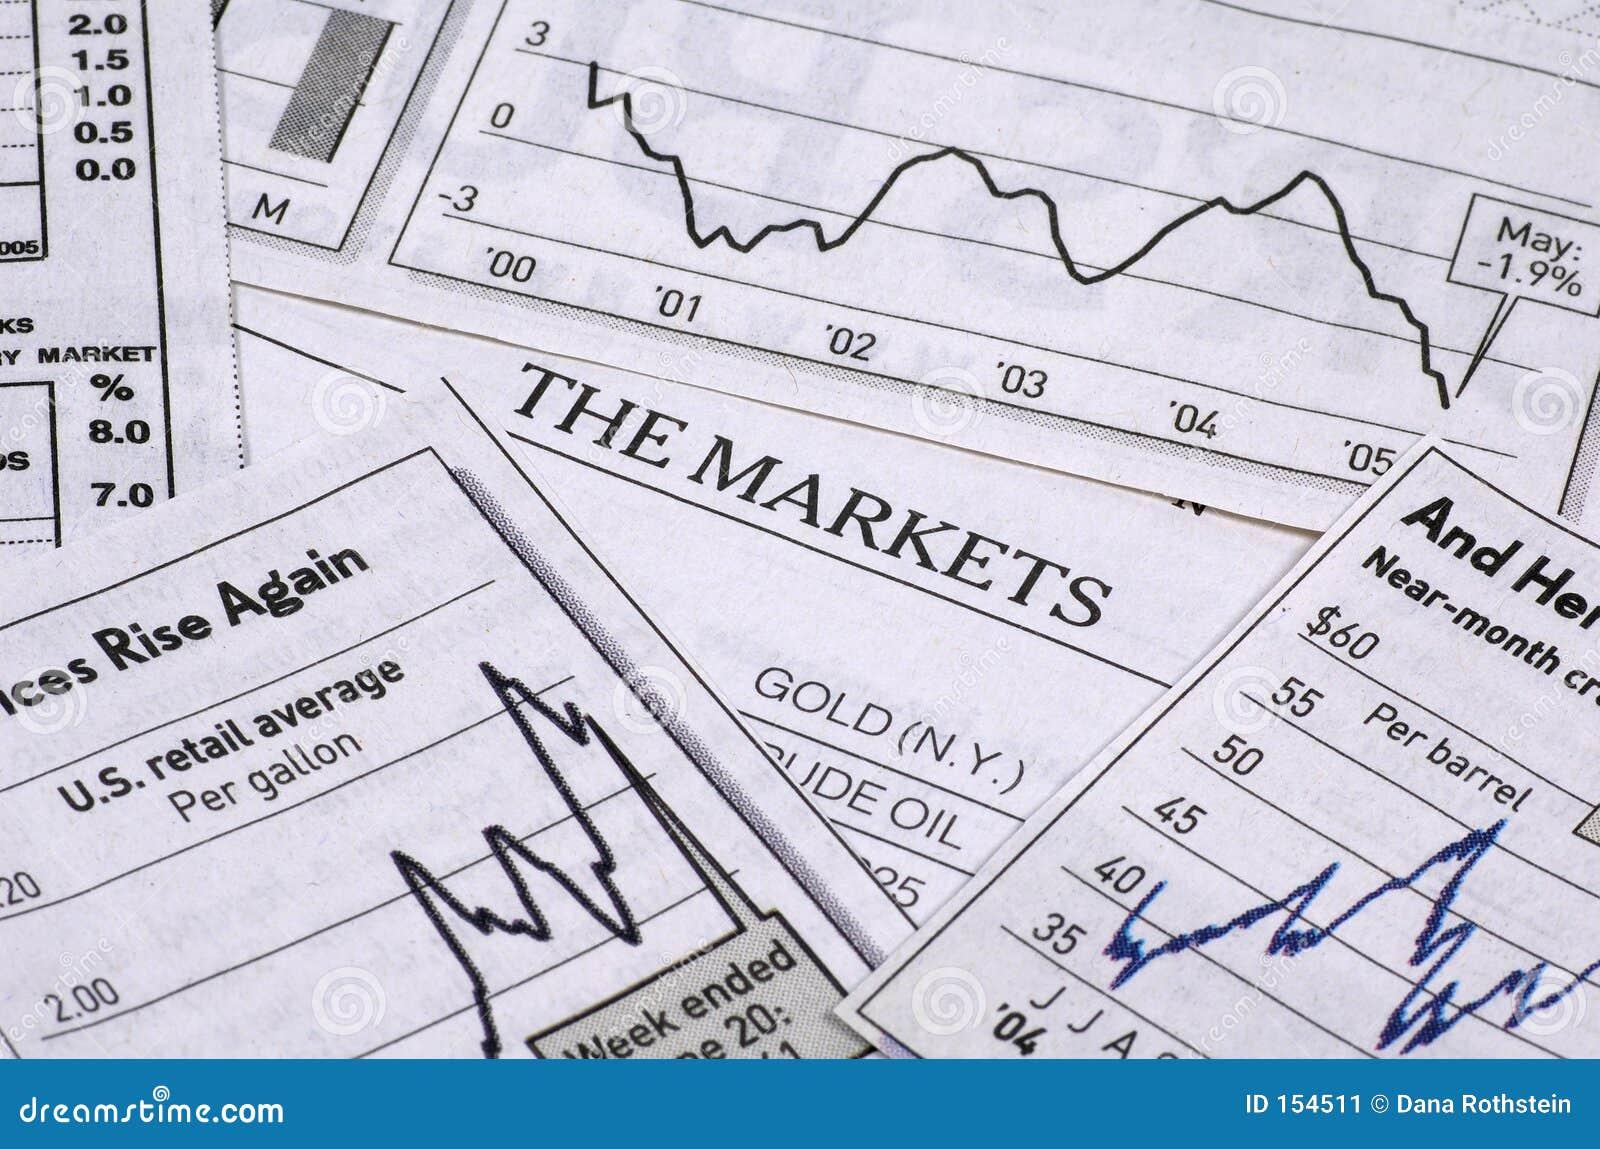 The Markets